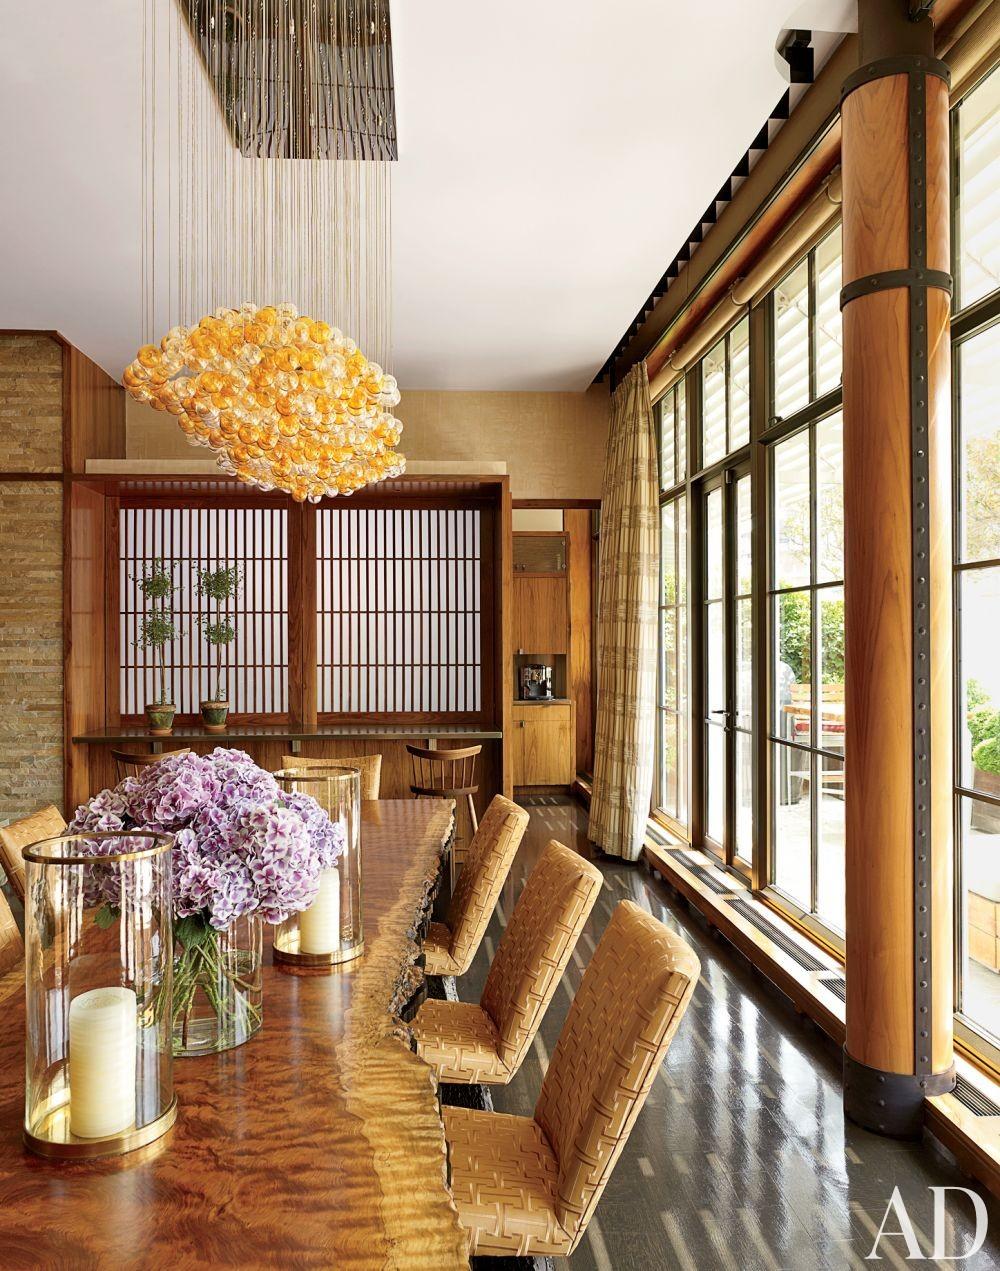 Modern Dining Room by De la Torre Design Studio and Cooper, Robertson & Partners in New York, New York